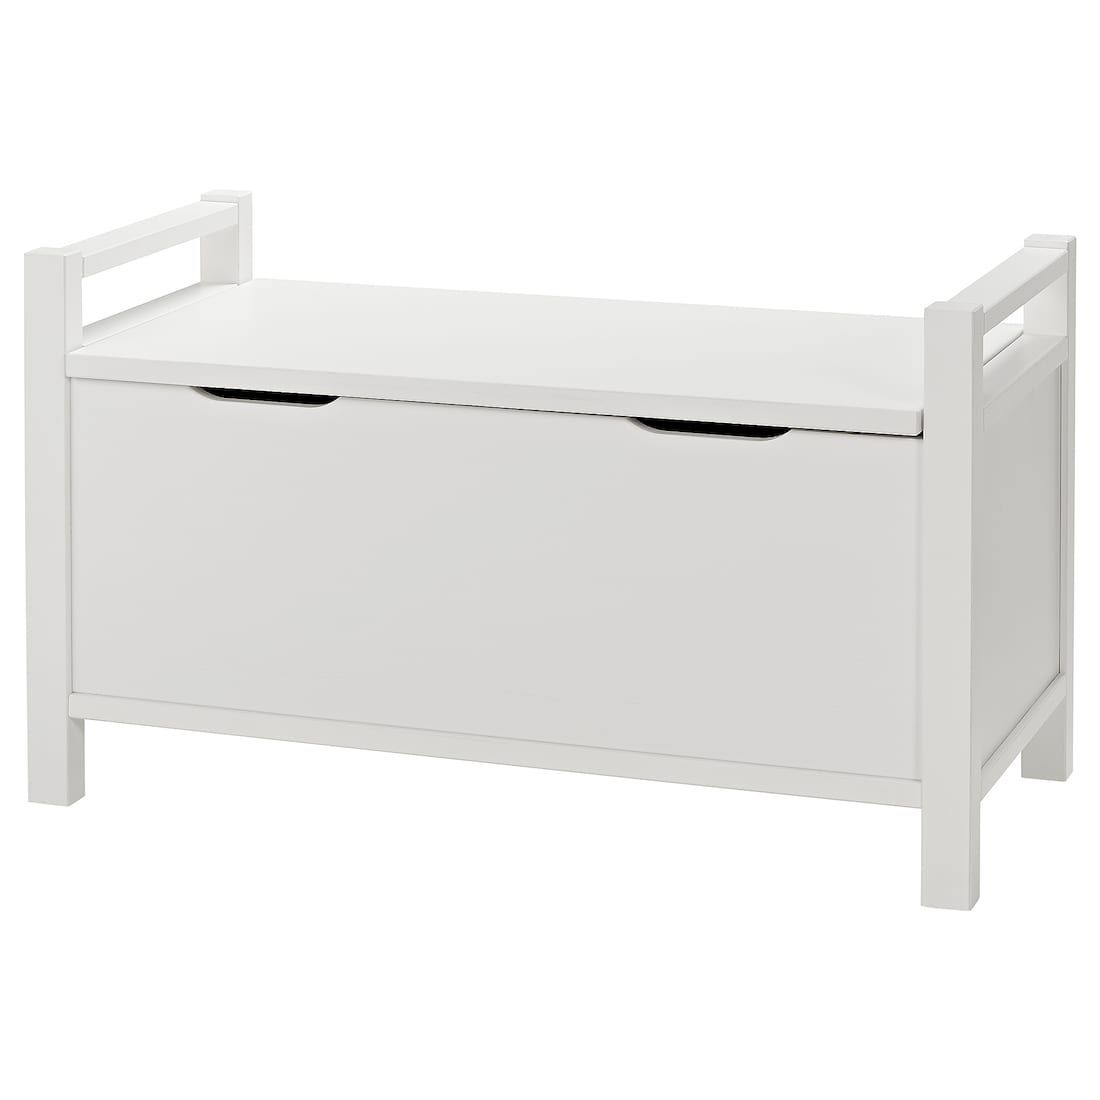 Hemnes Banc Coffre Blanc Teinte Blanc Banc Coffre Coffre Blanc Stockage Ikea